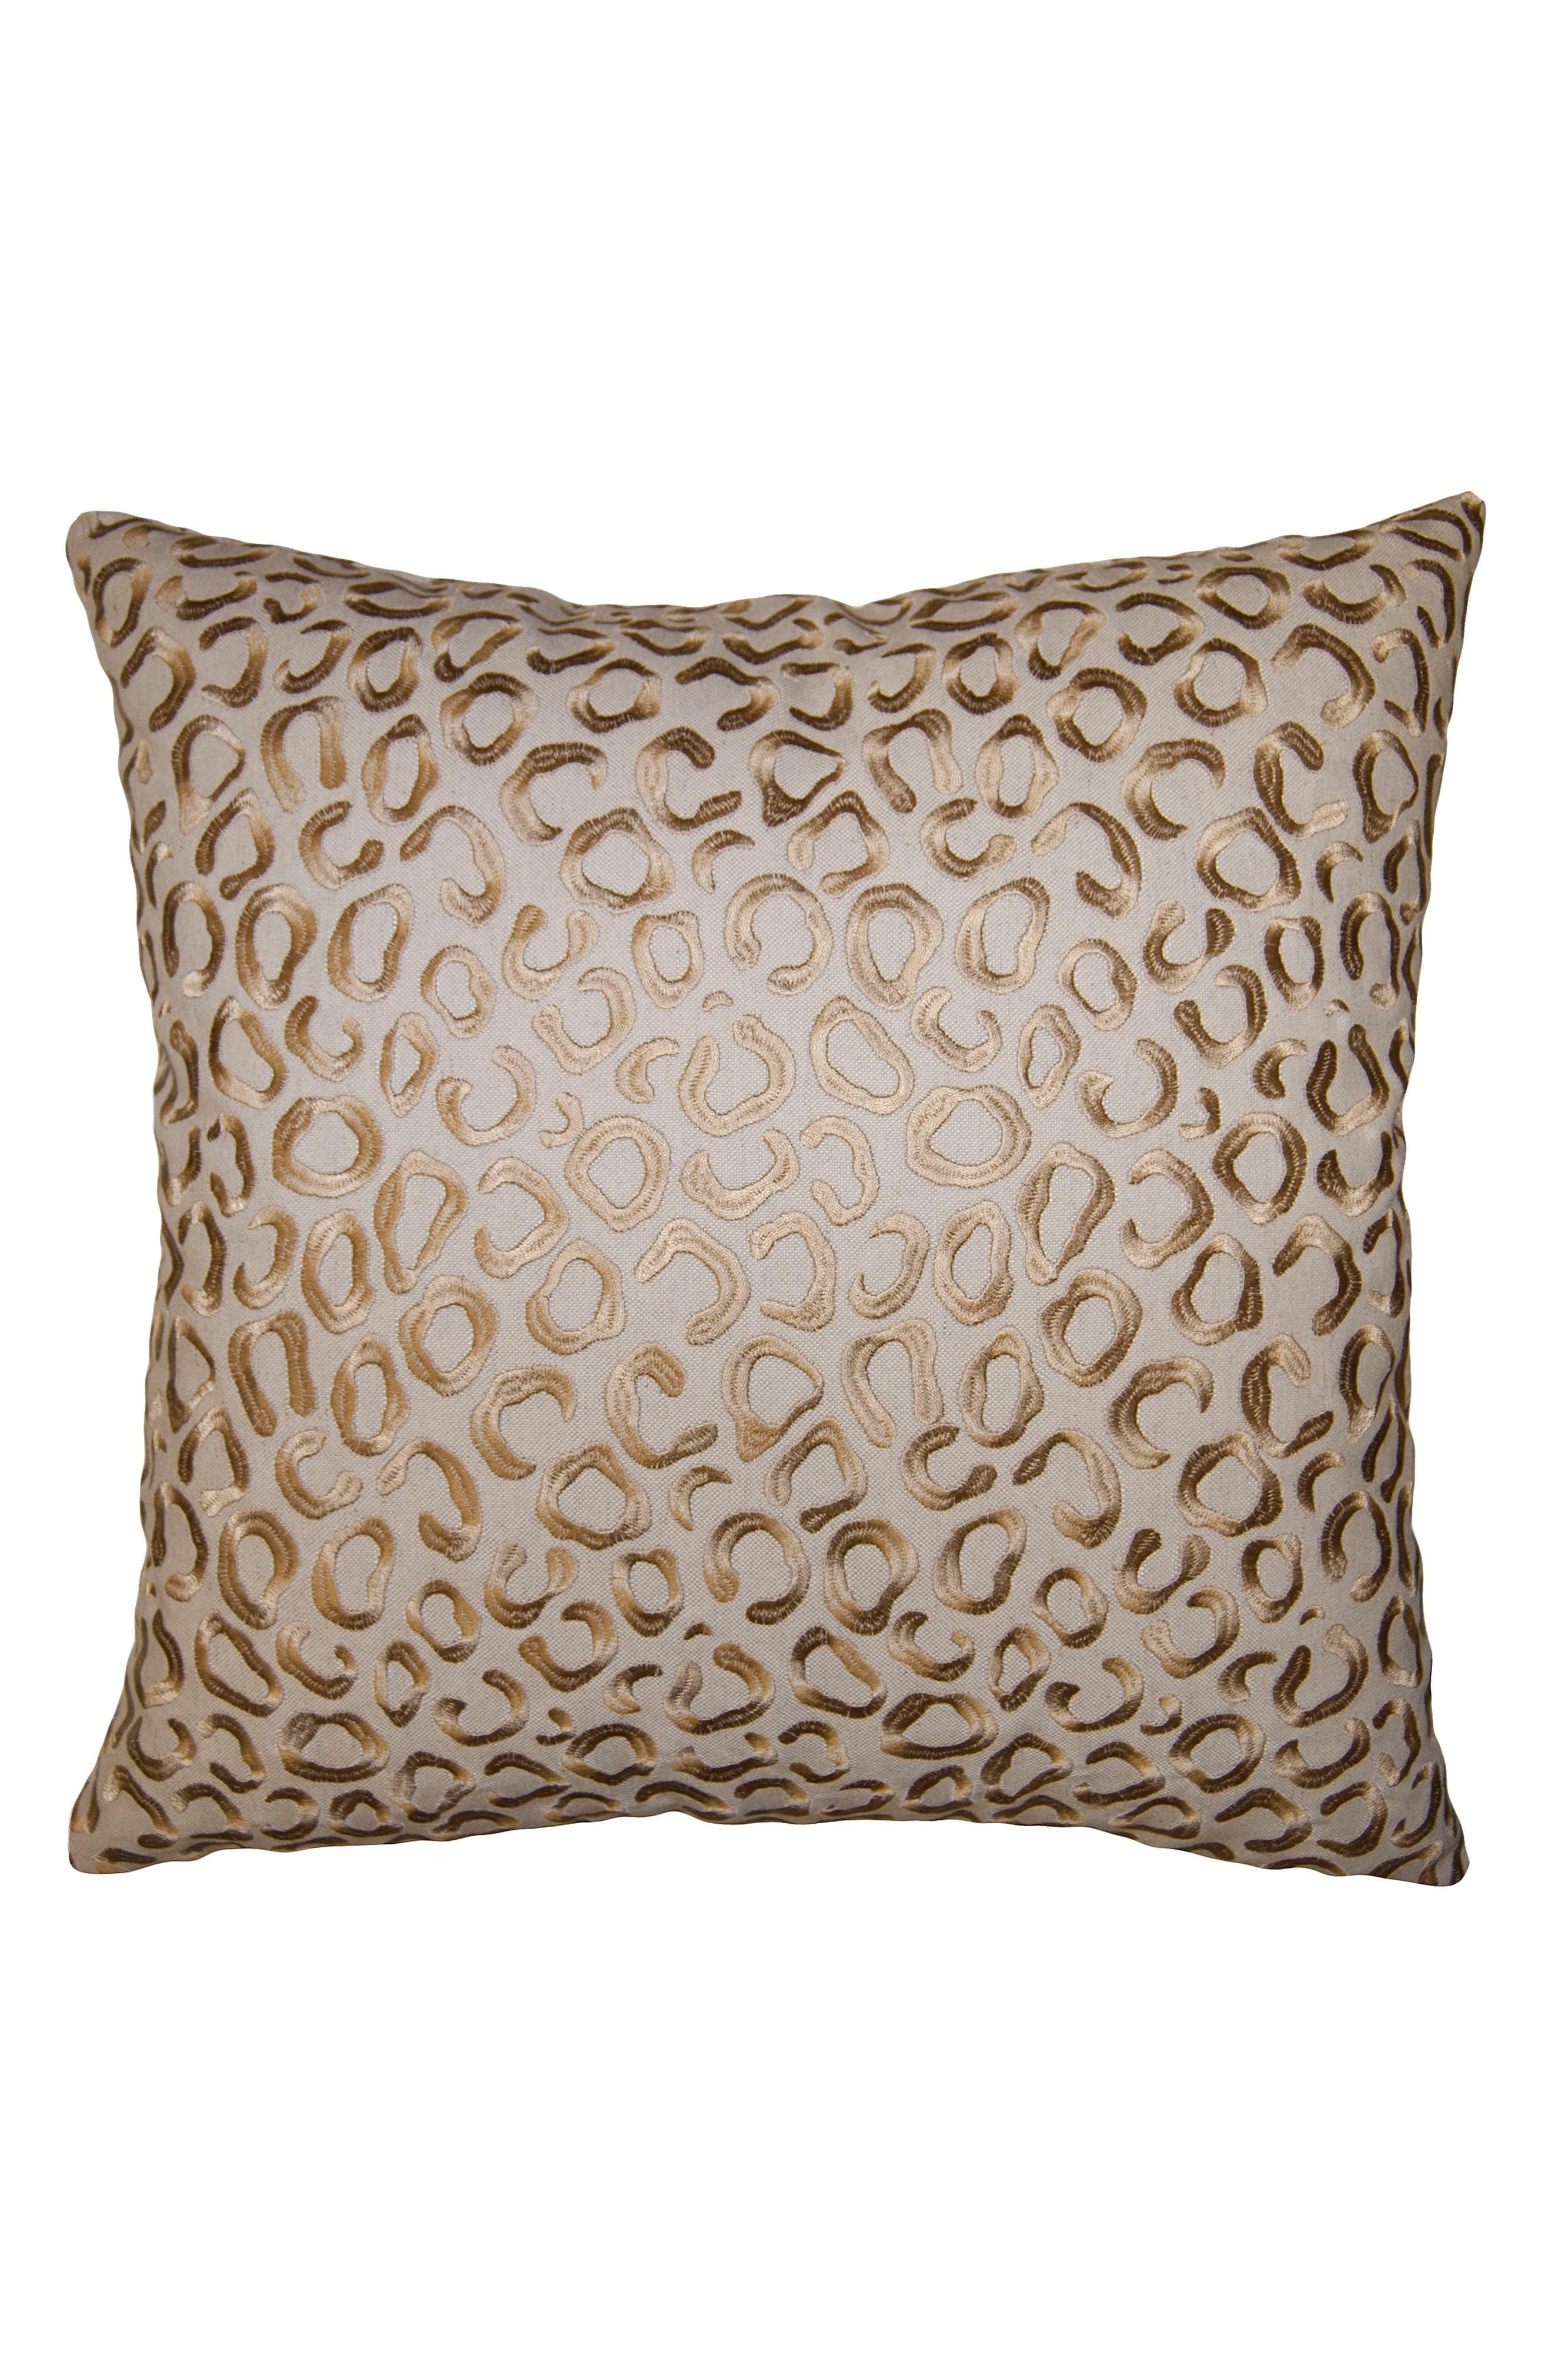 Restu Accent Pillow,                         Main,                         color, TAN